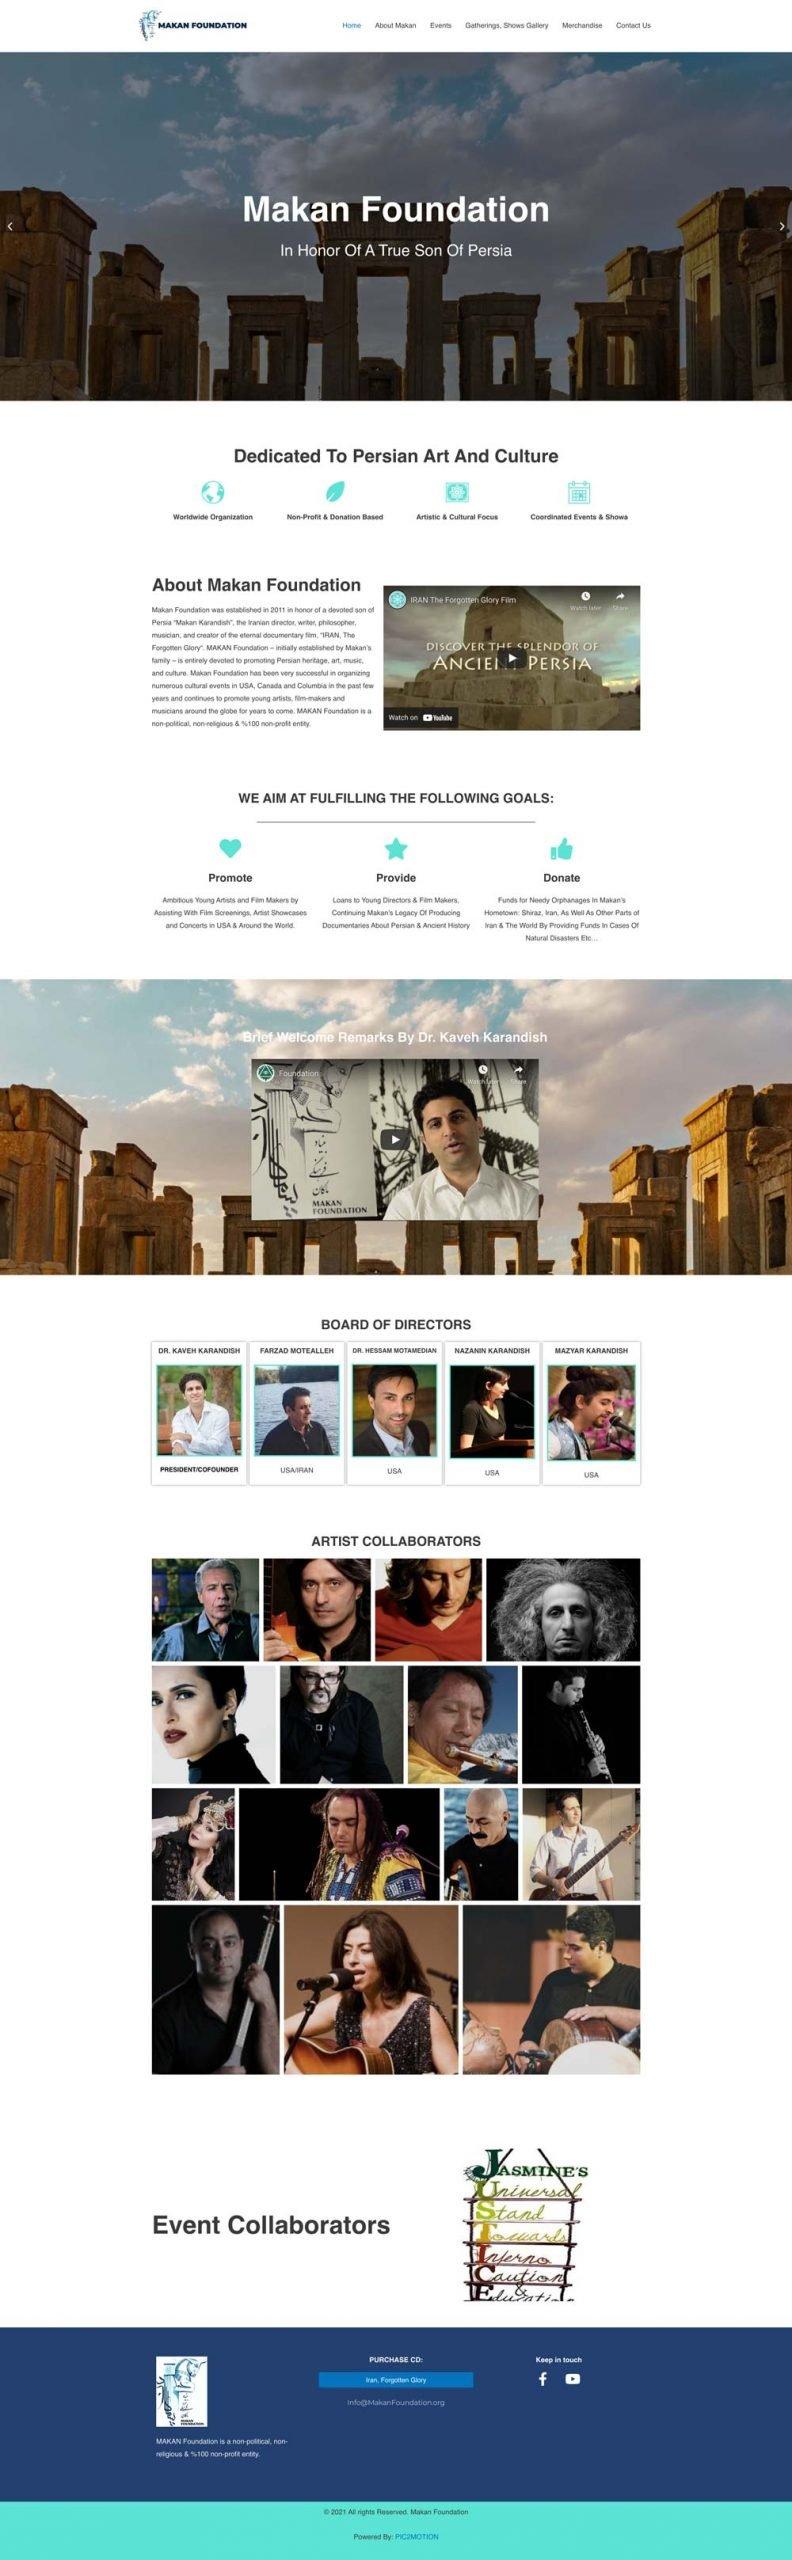 Makan-Foundation-Non-Profit-Non-Political-Organization--Web-design-and-development-by--PIC2MOTION